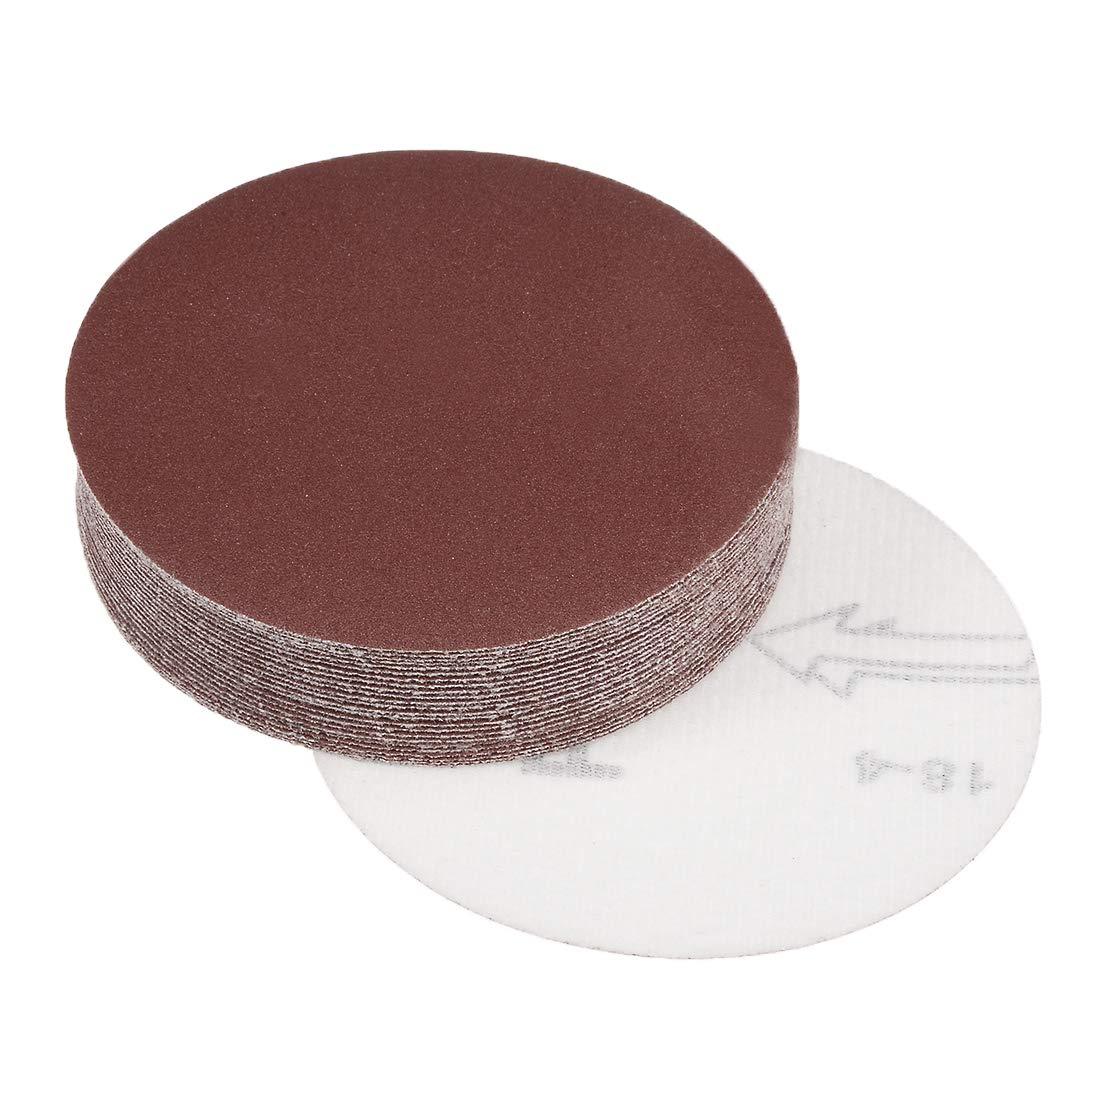 uxcell 4-Inch Sanding Disc 80 Grits Aluminum Oxide Flocking Back Sandpapers for Sanders 25 Pcs